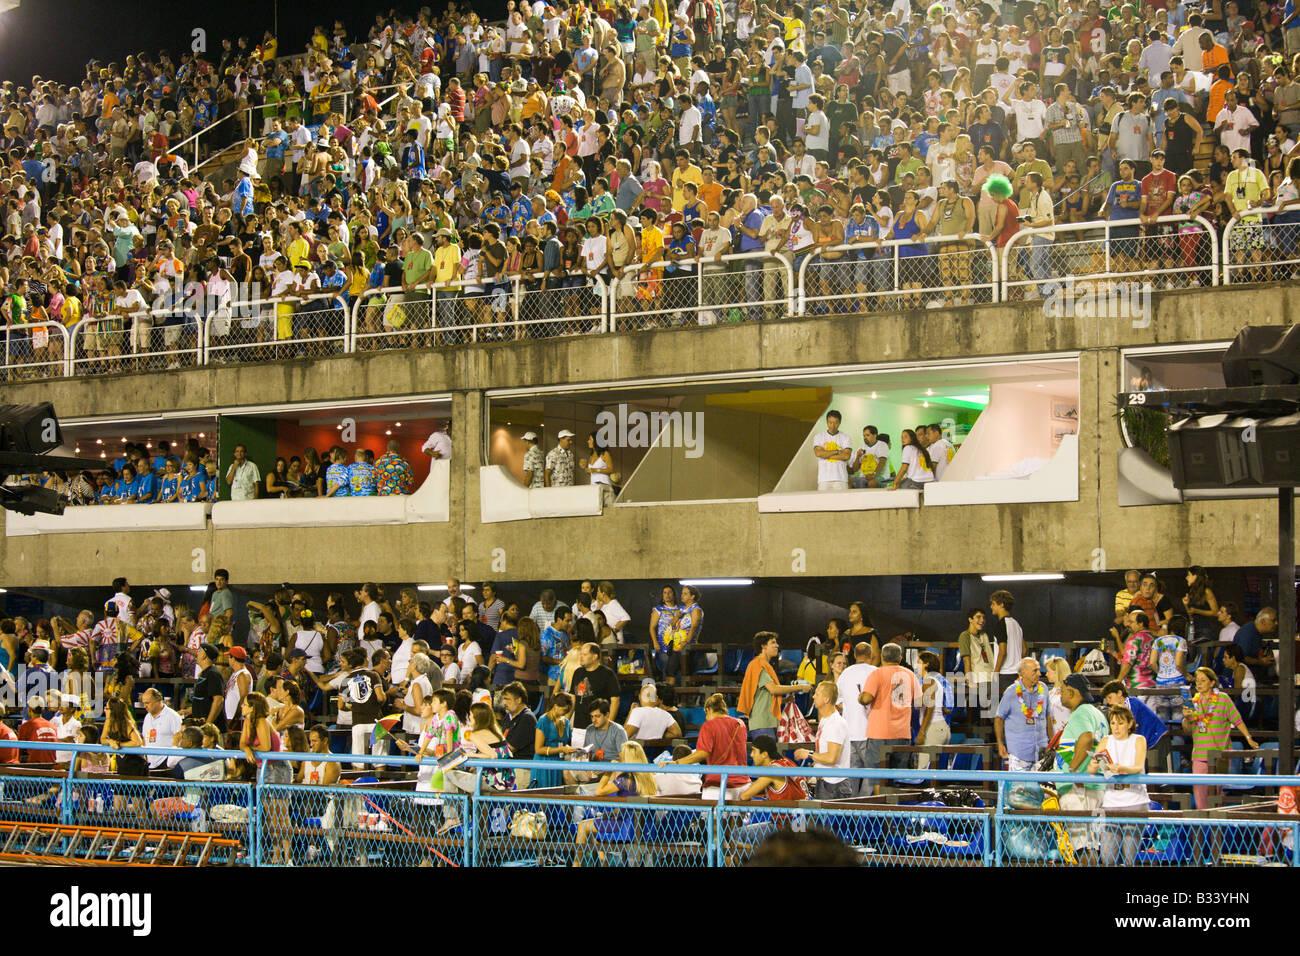 The world famous Carnaval parade at the Sambodromo Rio de Janeiro Brazil - Stock Image